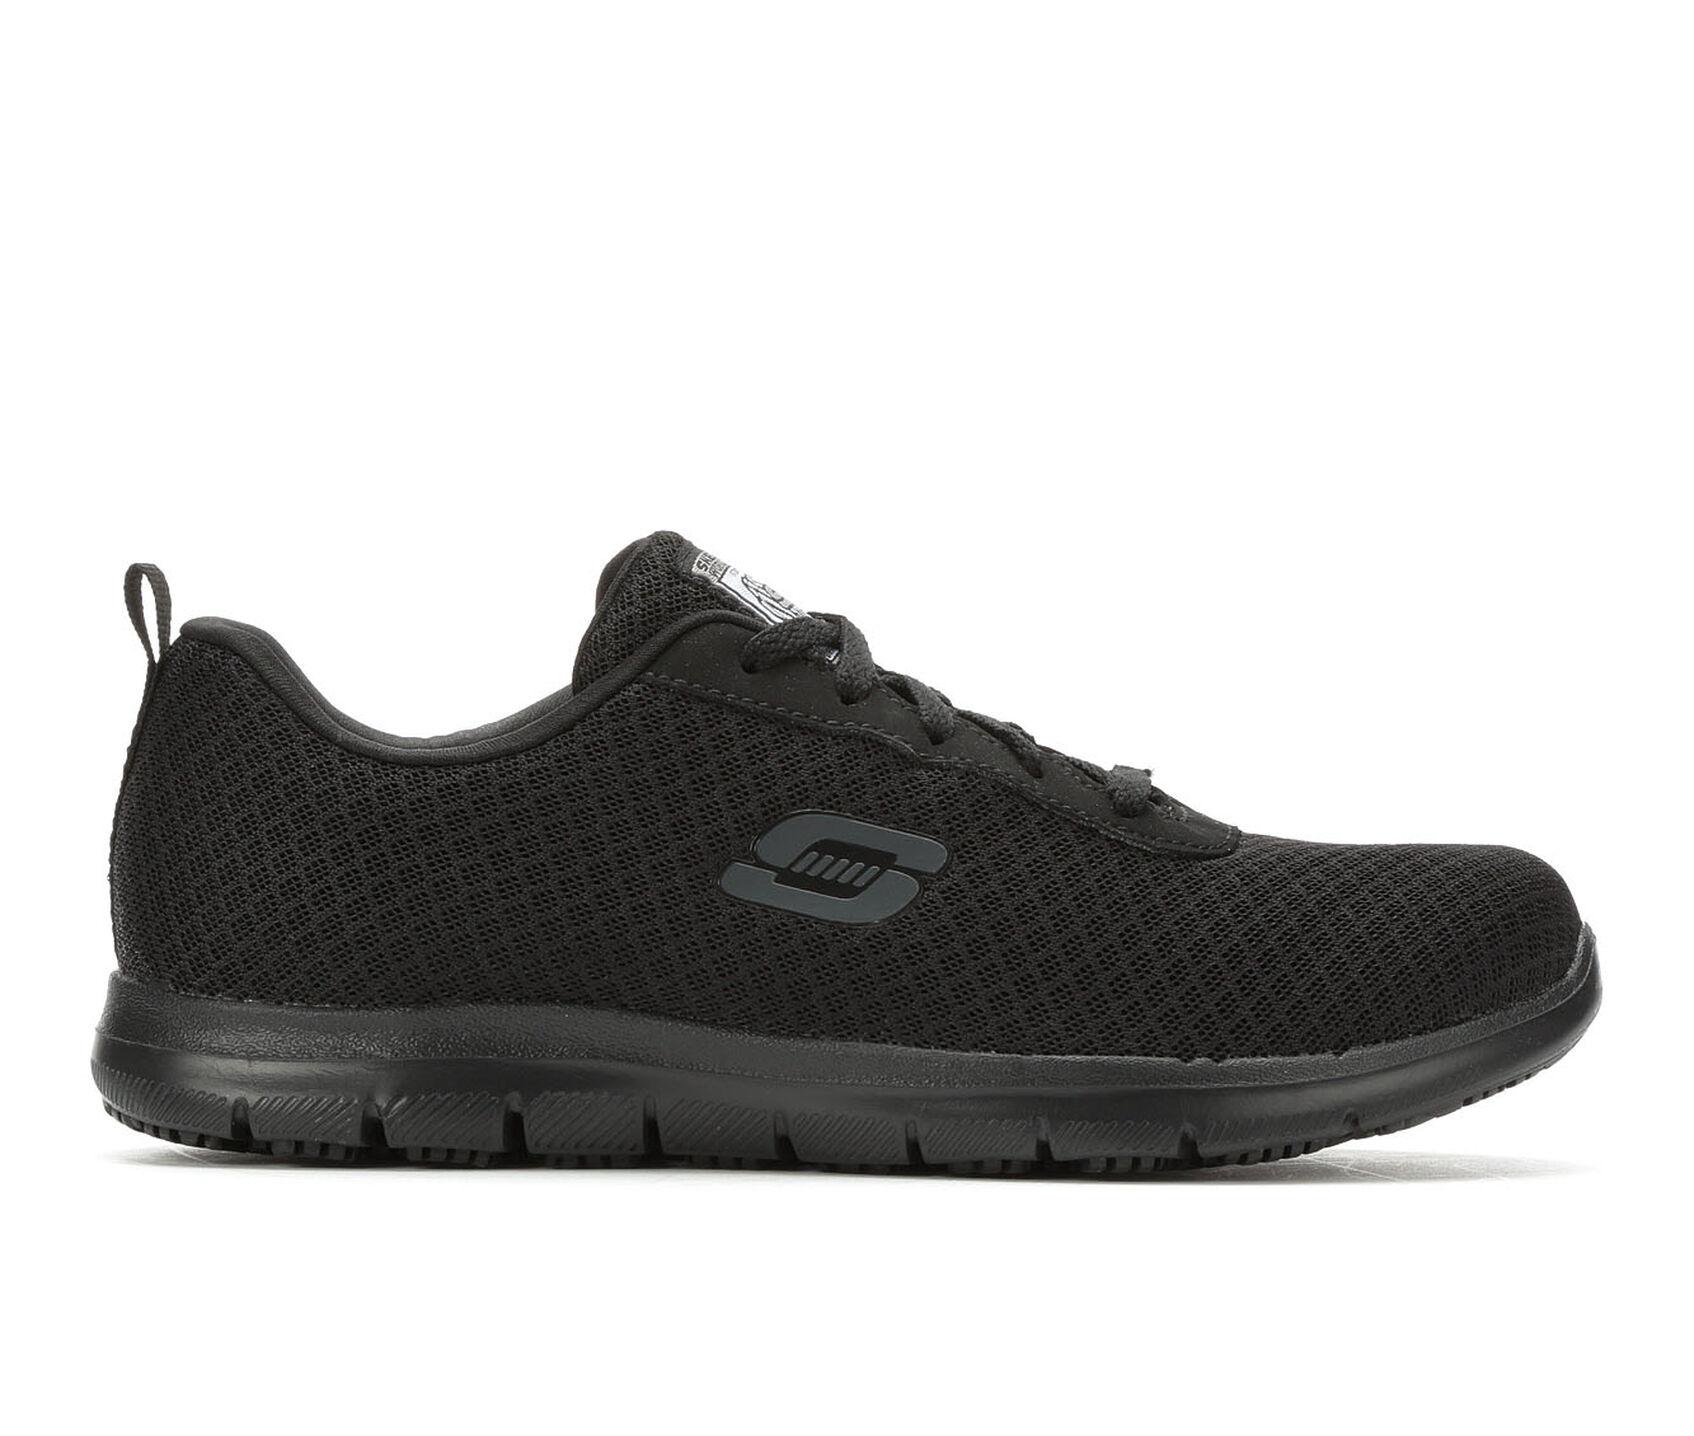 1d5fbb8c54e Women's Skechers Work 77210 Bronaugh Slip Resistant Safety Shoes ...